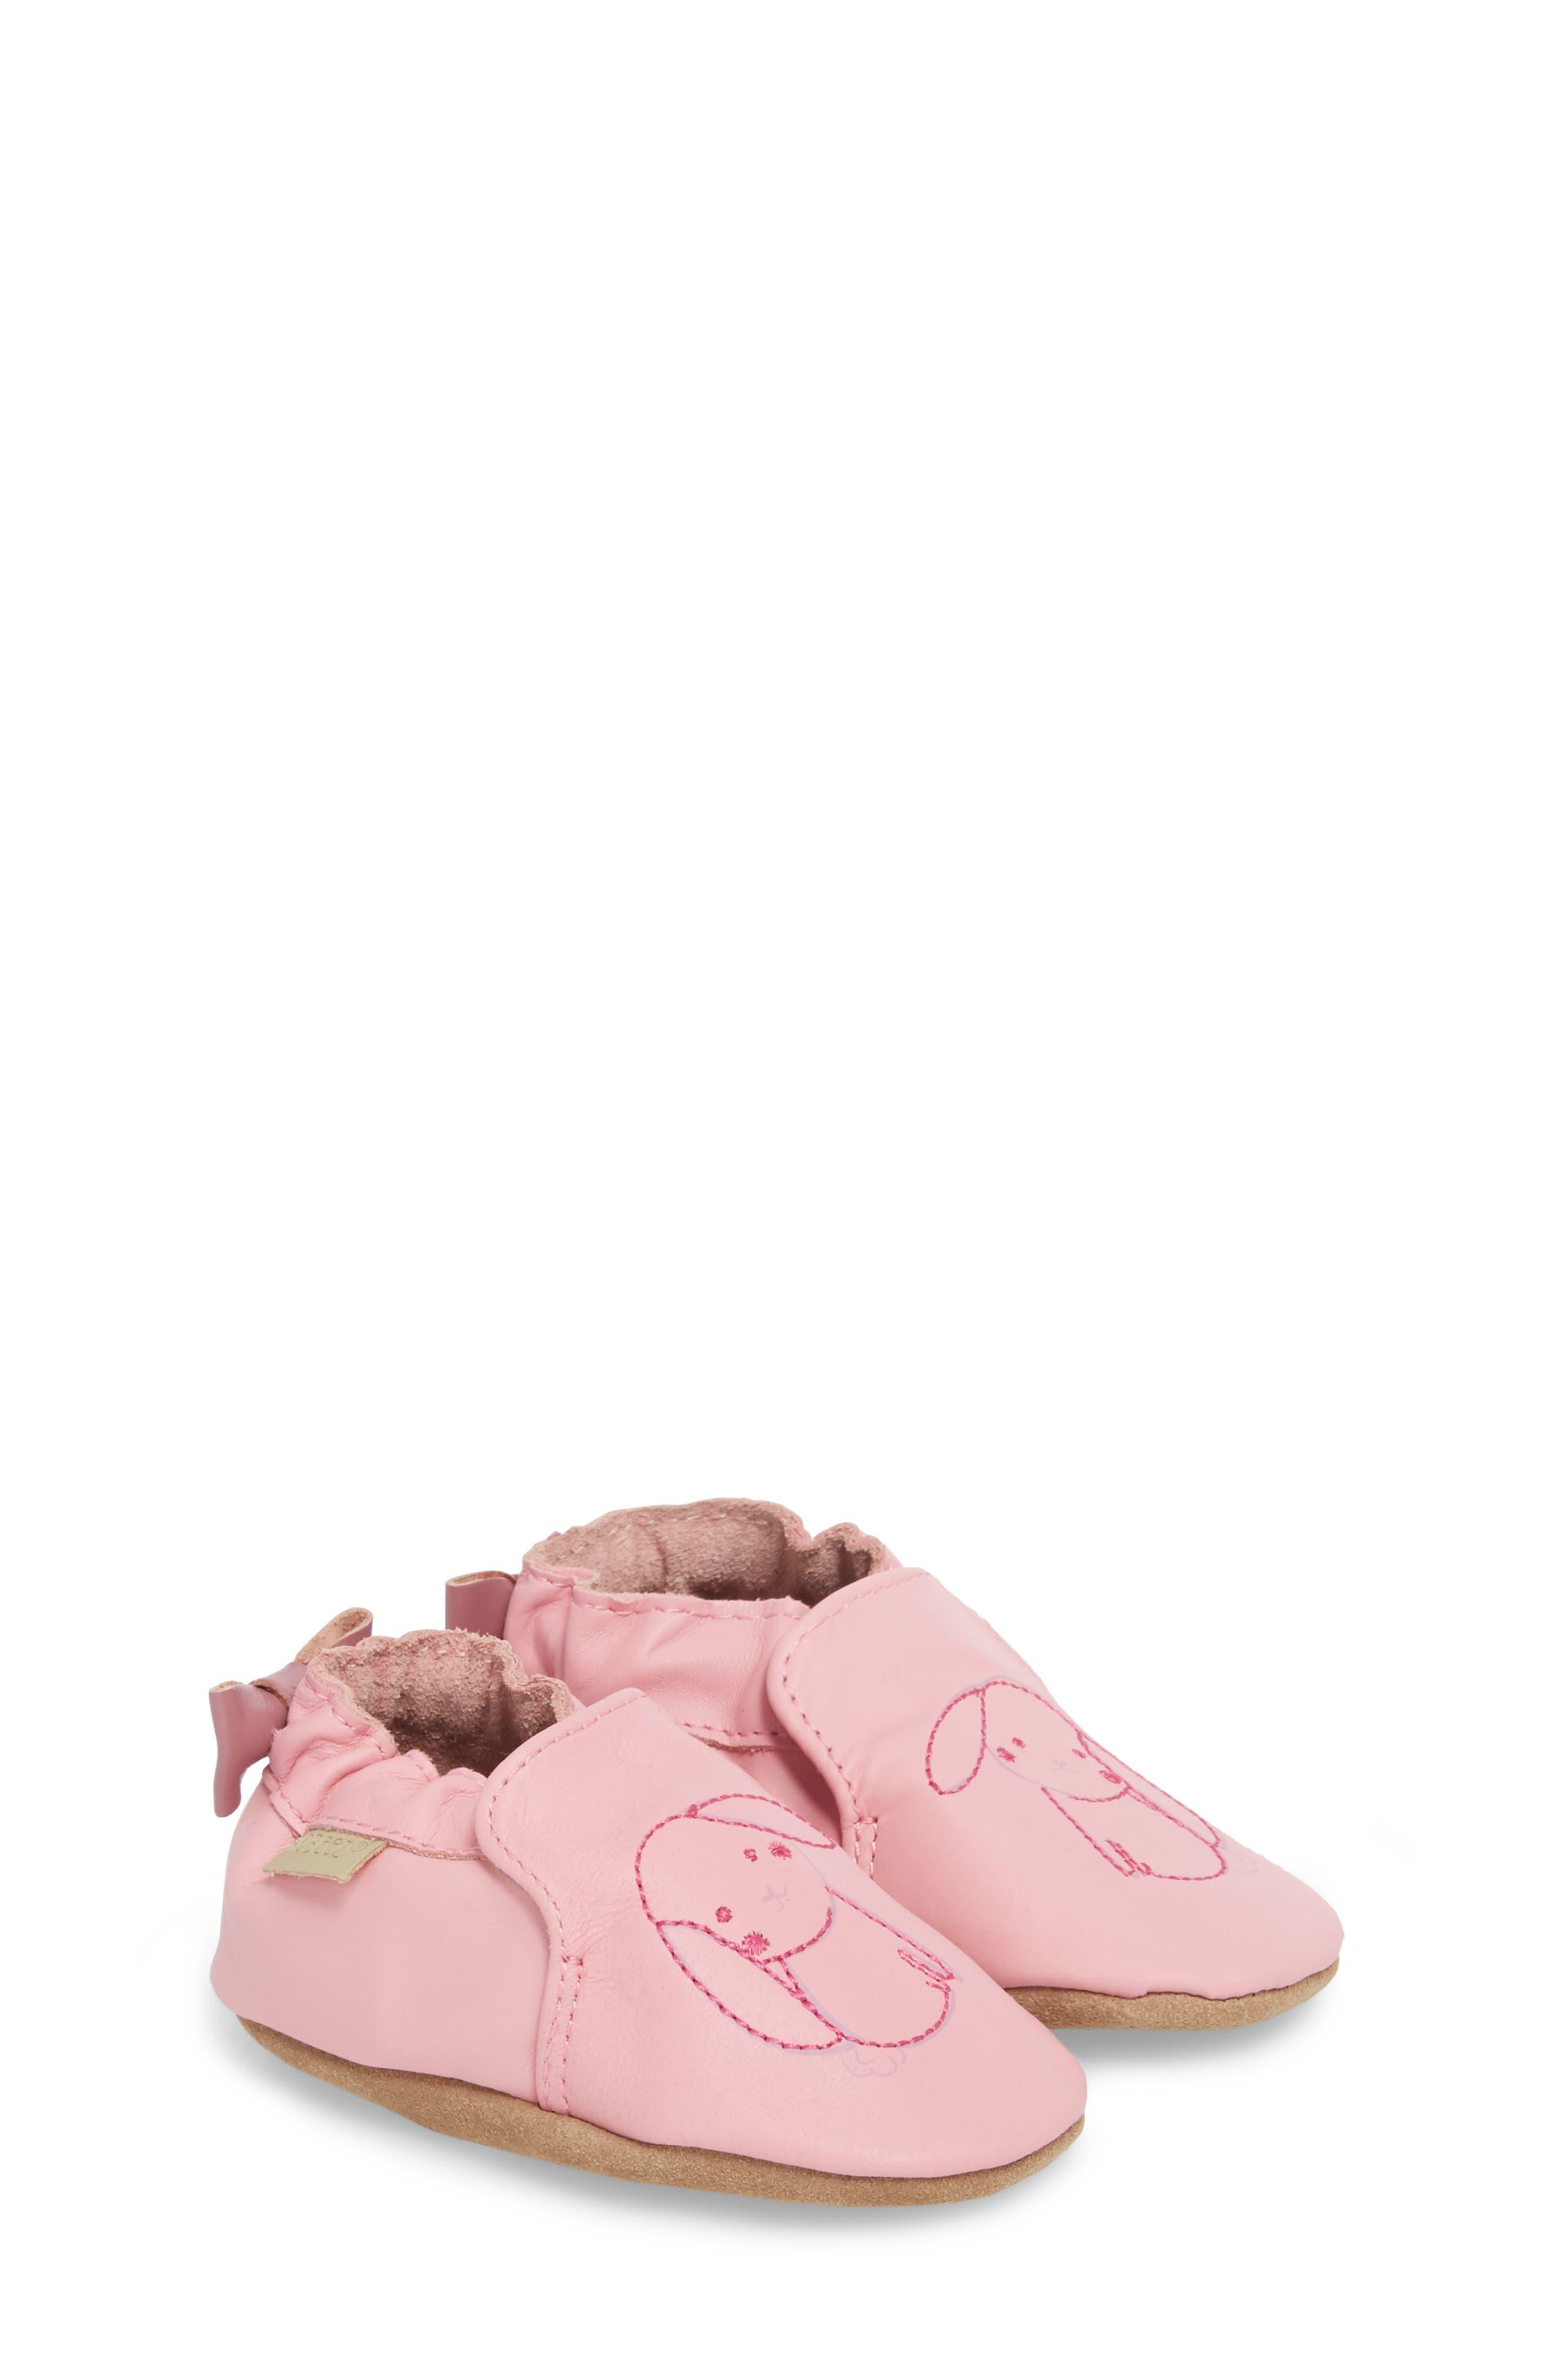 Sweet Bunny Moccasin Crib Shoe,                             Alternate thumbnail 3, color,                             Pastel Pink